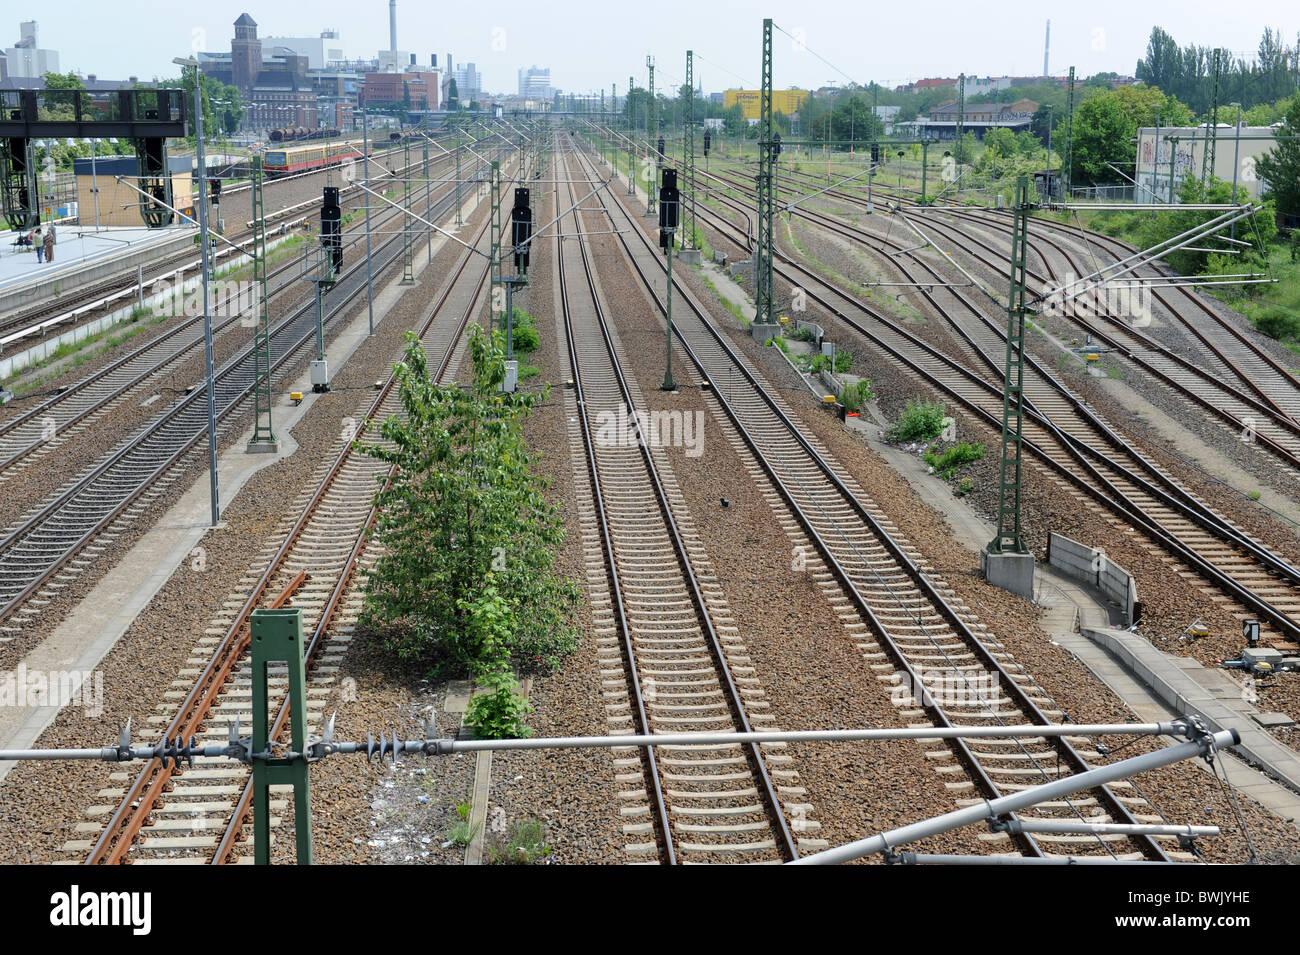 Railway tracks at Beusselstraße station Berlin Germany Deutschland Europe - Stock Image